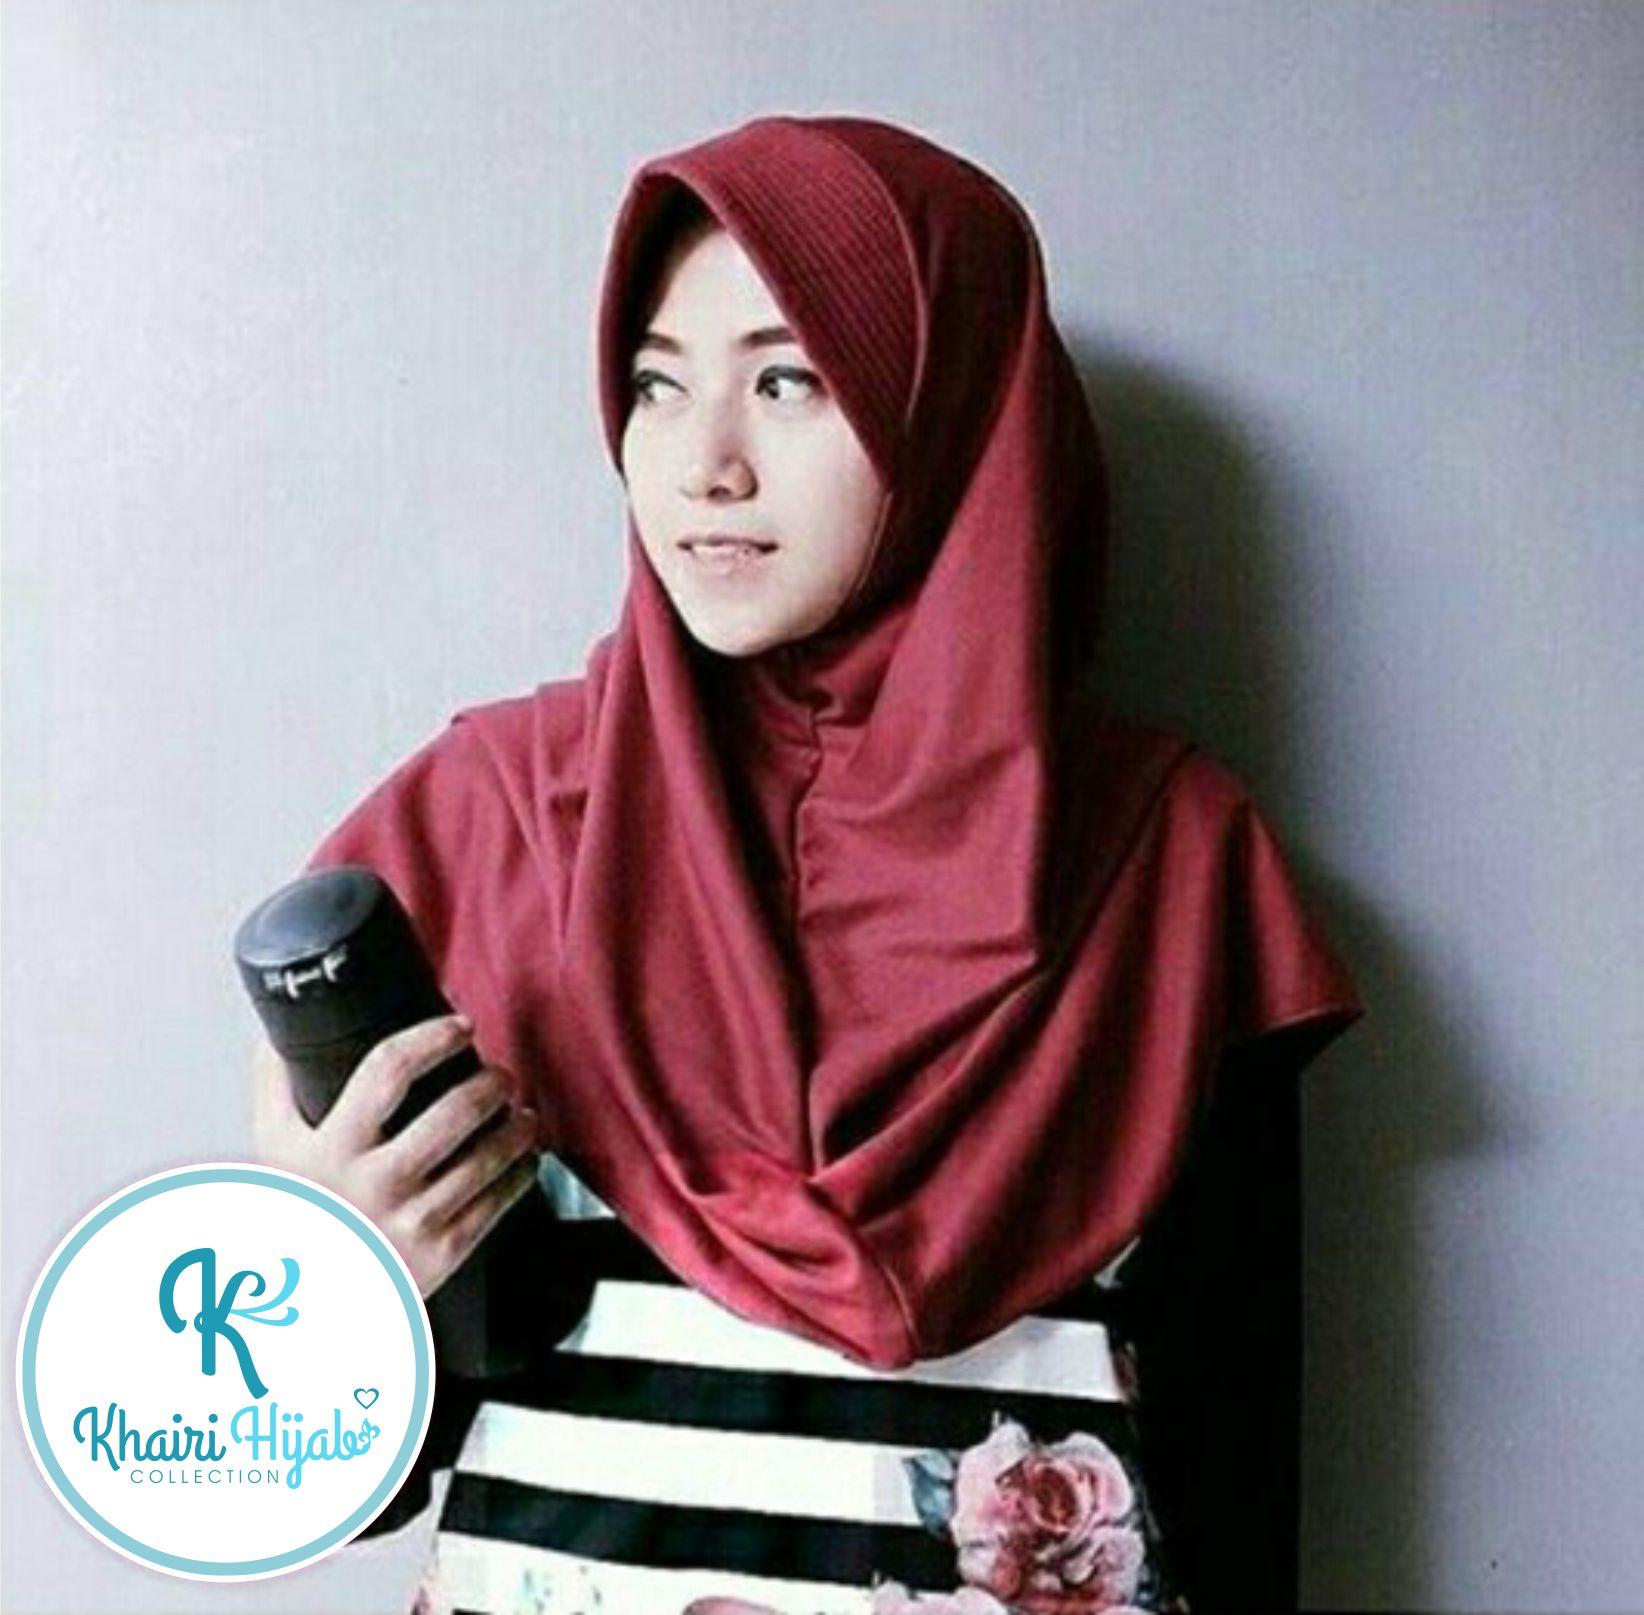 Jual Jilbab Polos Hijab Kaos Jilbab adem Jilbab Sekolah Size XL Khairi Hijab